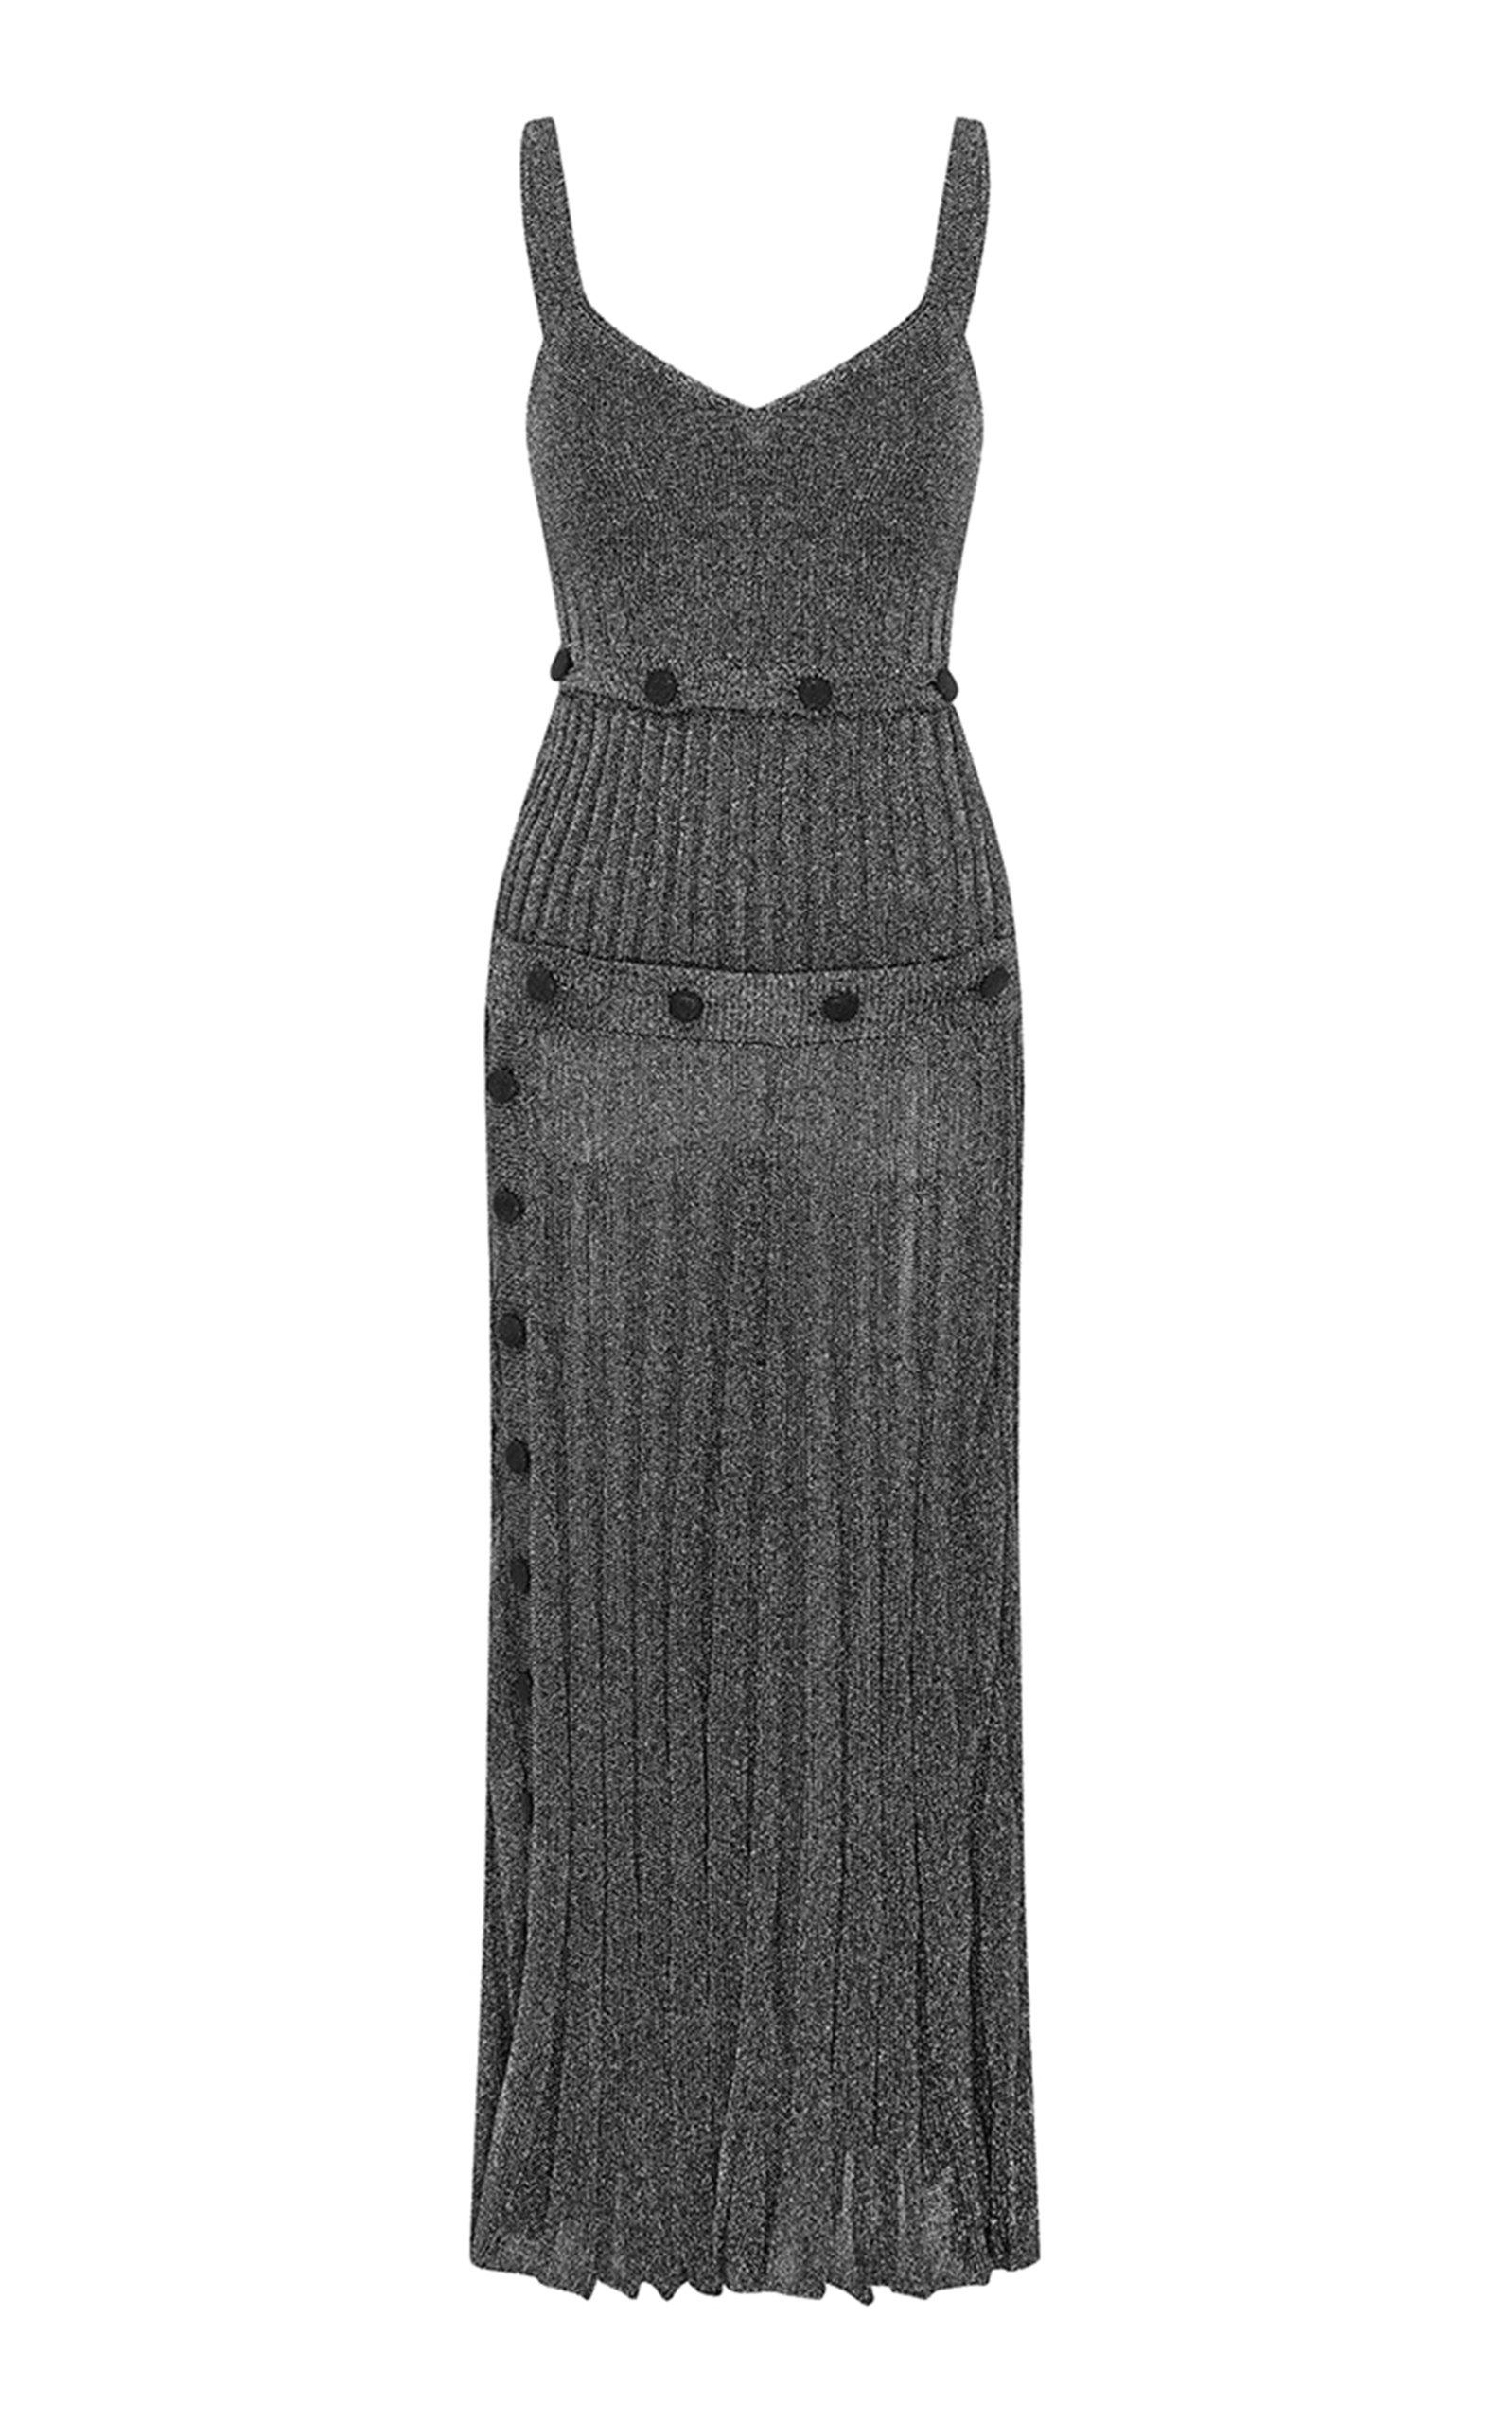 Buy Christopher Esber Button-Detailed Rib-Knit Lurex Dress online, shop Christopher Esber at the best price